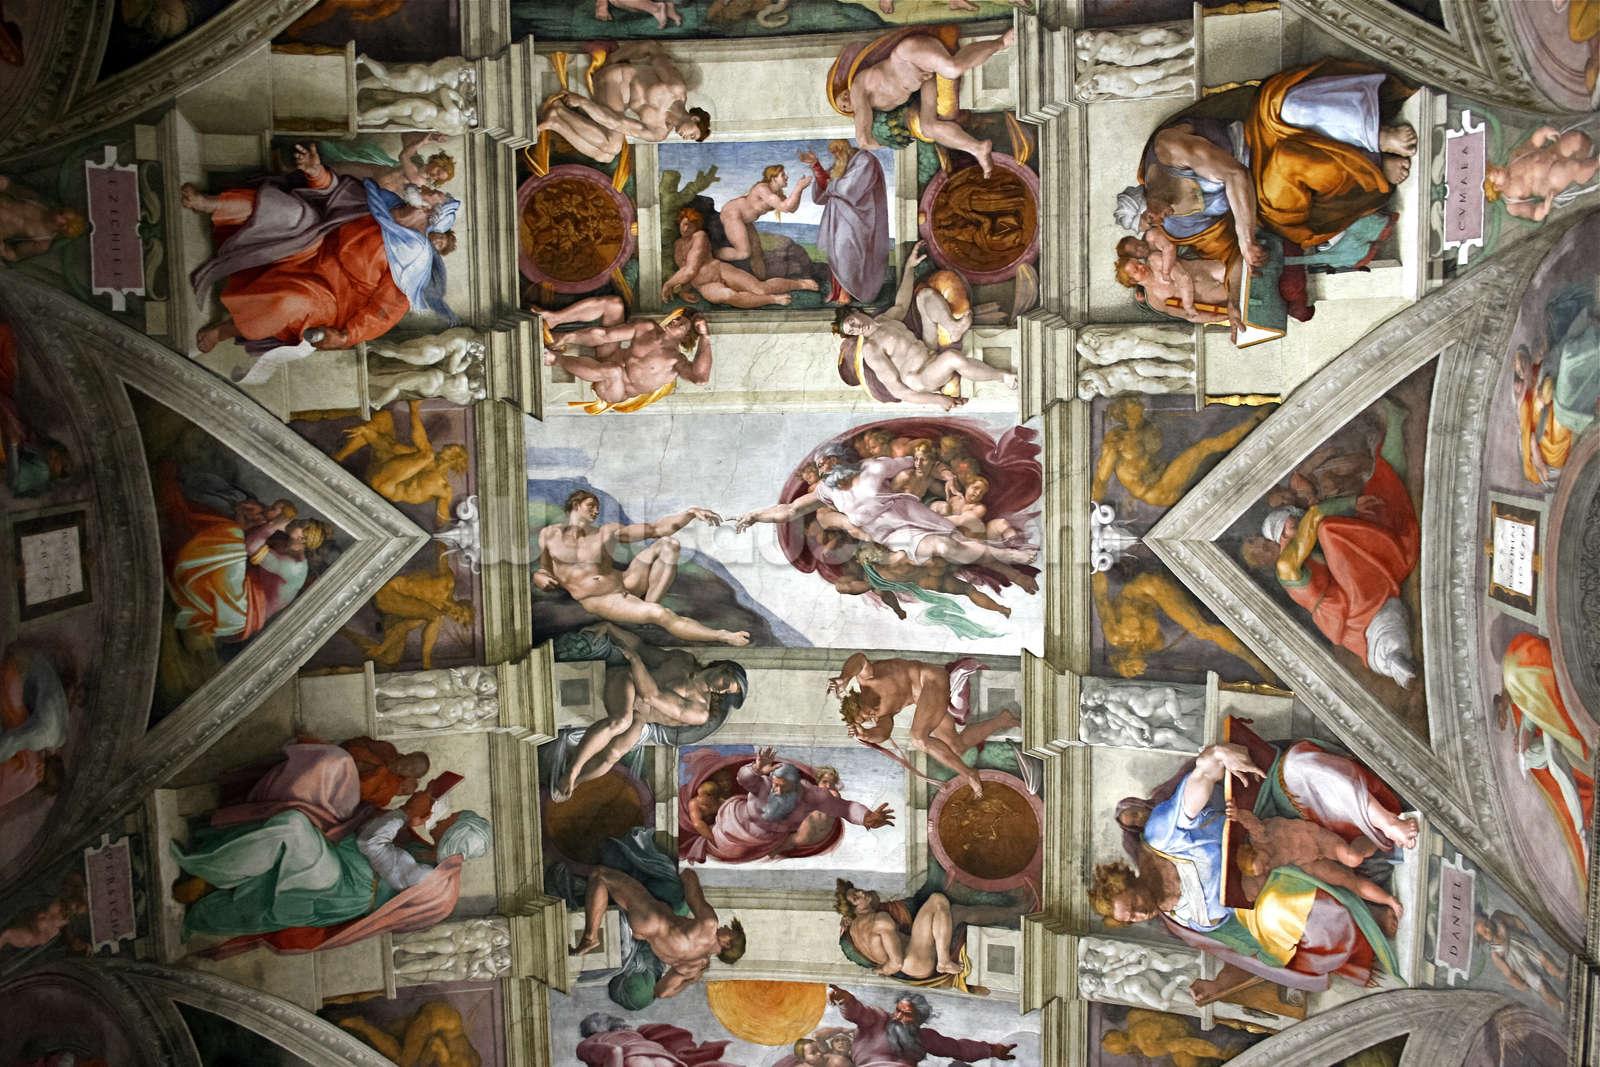 Romes Sistine Chapel Wallpaper Mural Wallsauce US 1600x1067